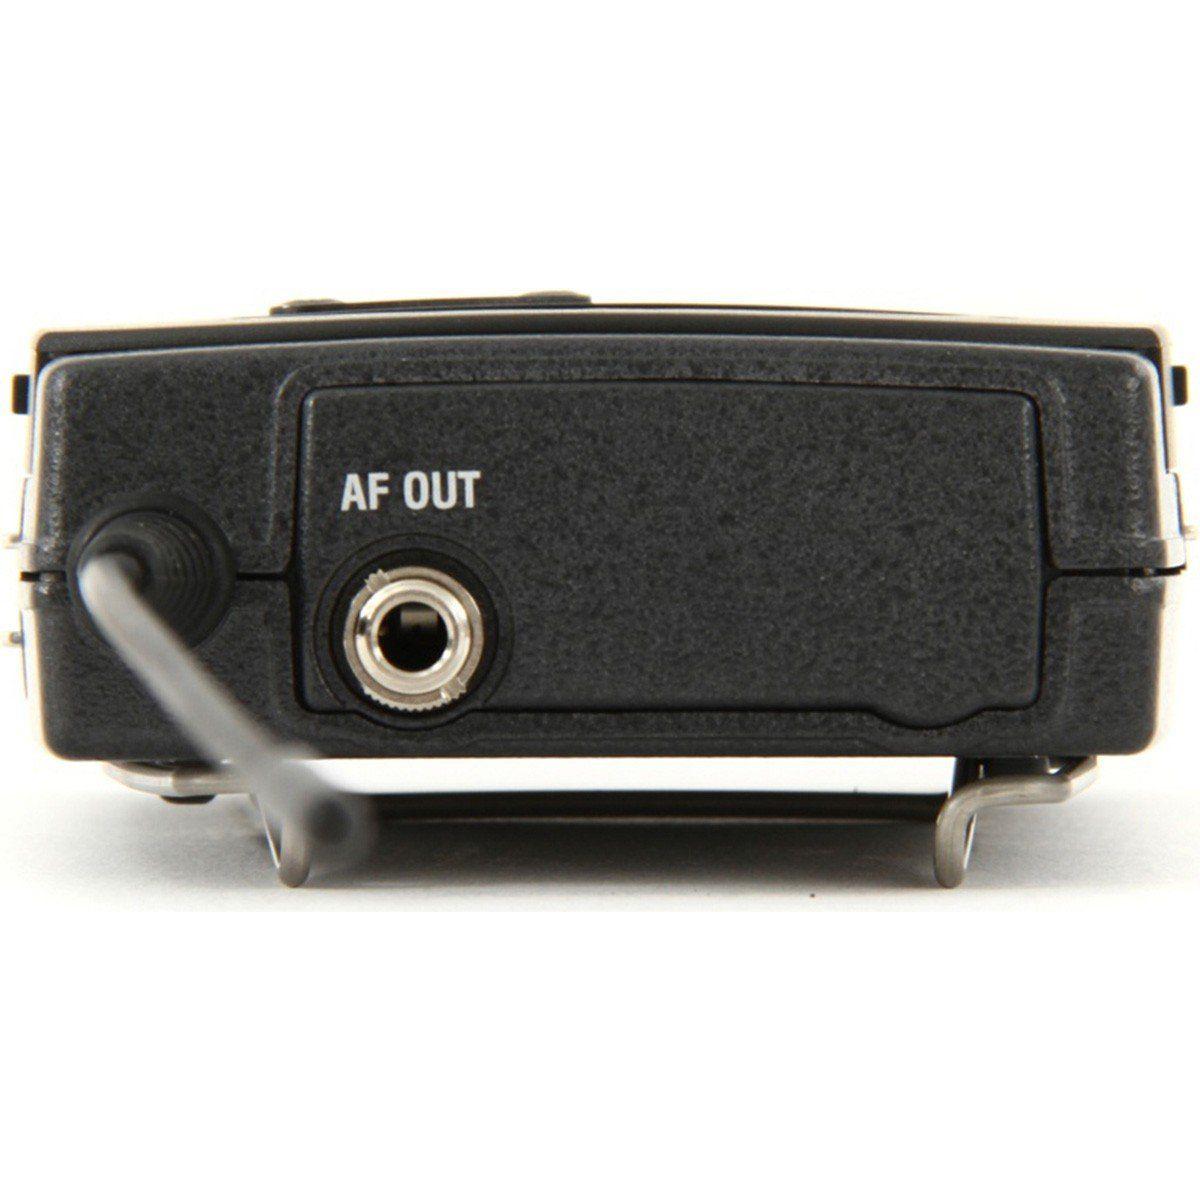 Sennheiser ew135pg3 Microfone sem Fio Sennheiser EW135p-G3 para Câmeras